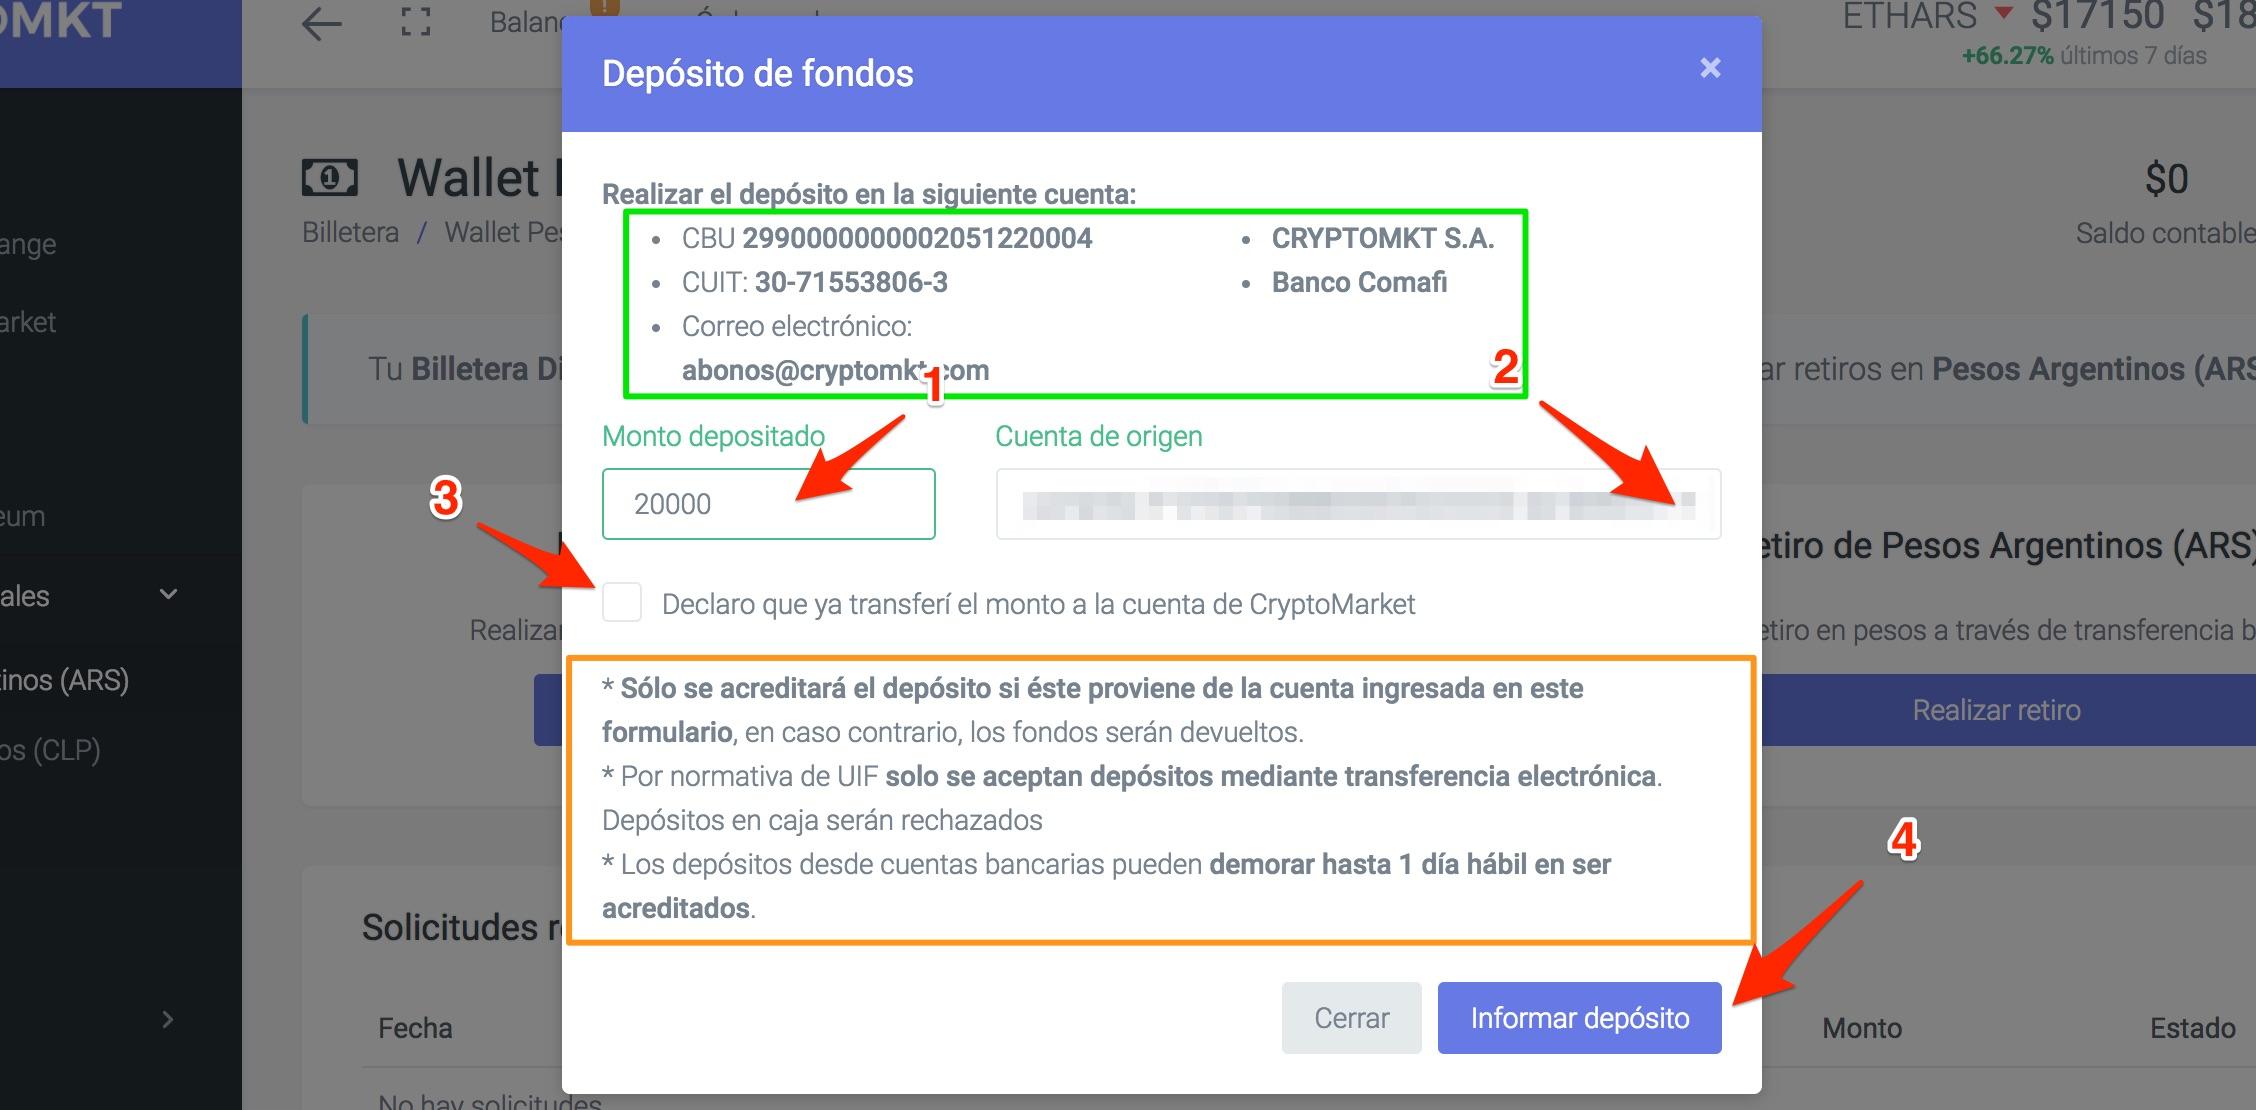 5 Deposit instructions.jpg